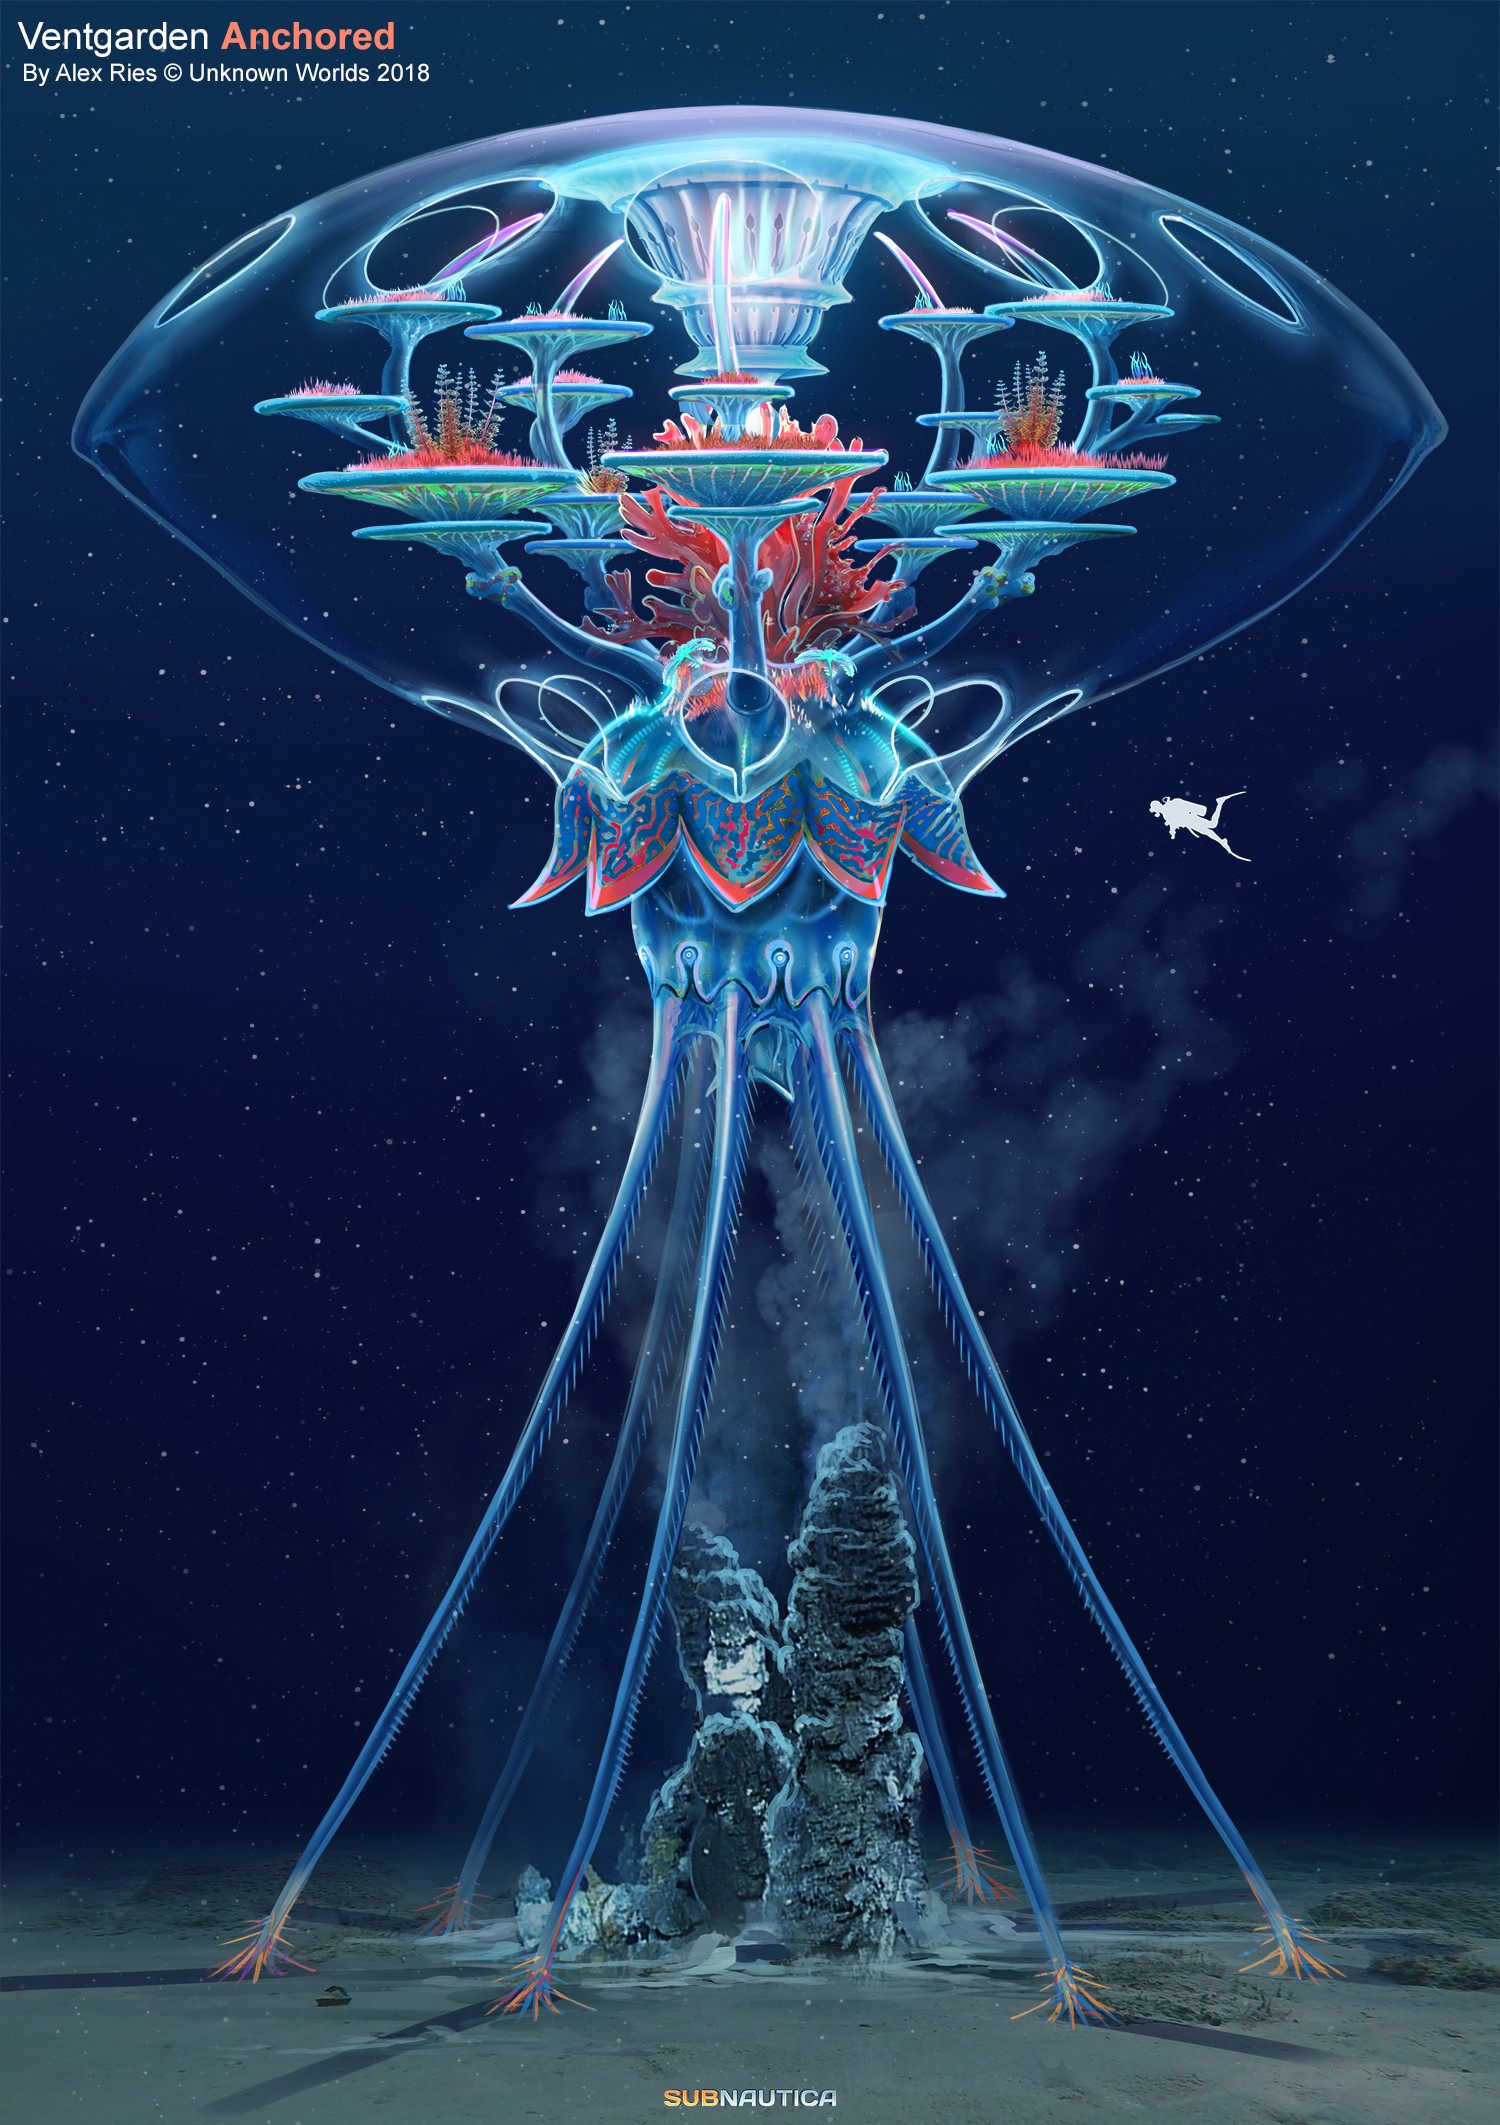 ArtStation - Subnautica: Below Zero - Ventgarden, Alex Ries